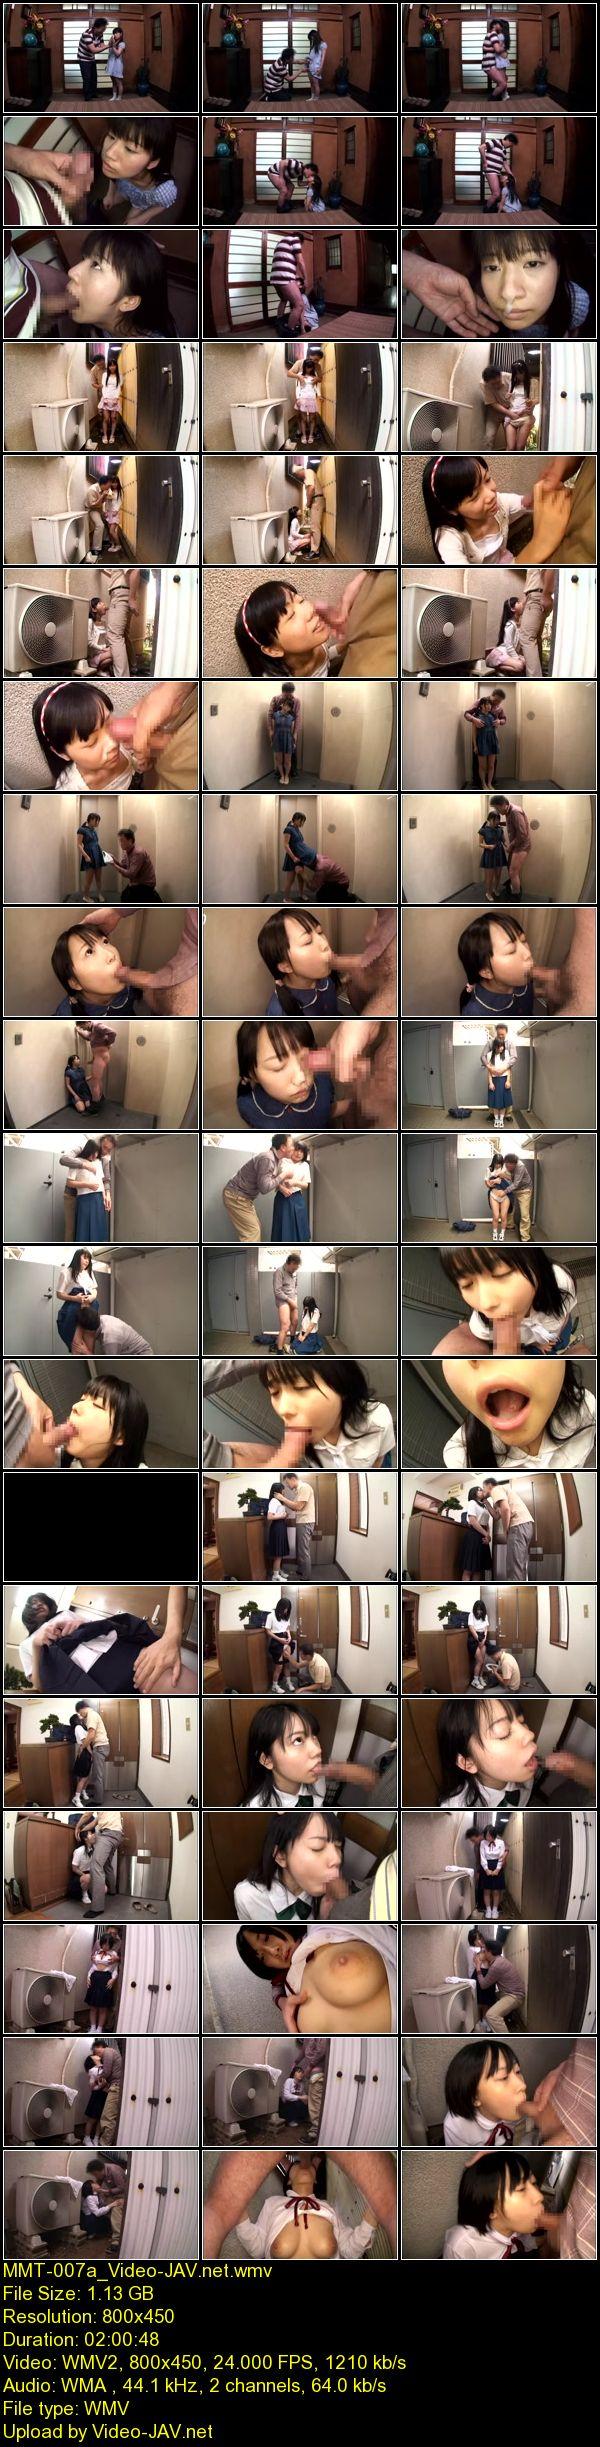 JAV Download [MMT 007] いたずら後の強制フェラチオ。 小さい女の子12人のお口へ。 濃厚名場面集 2。 ミニマム Lolita 2013 03 01